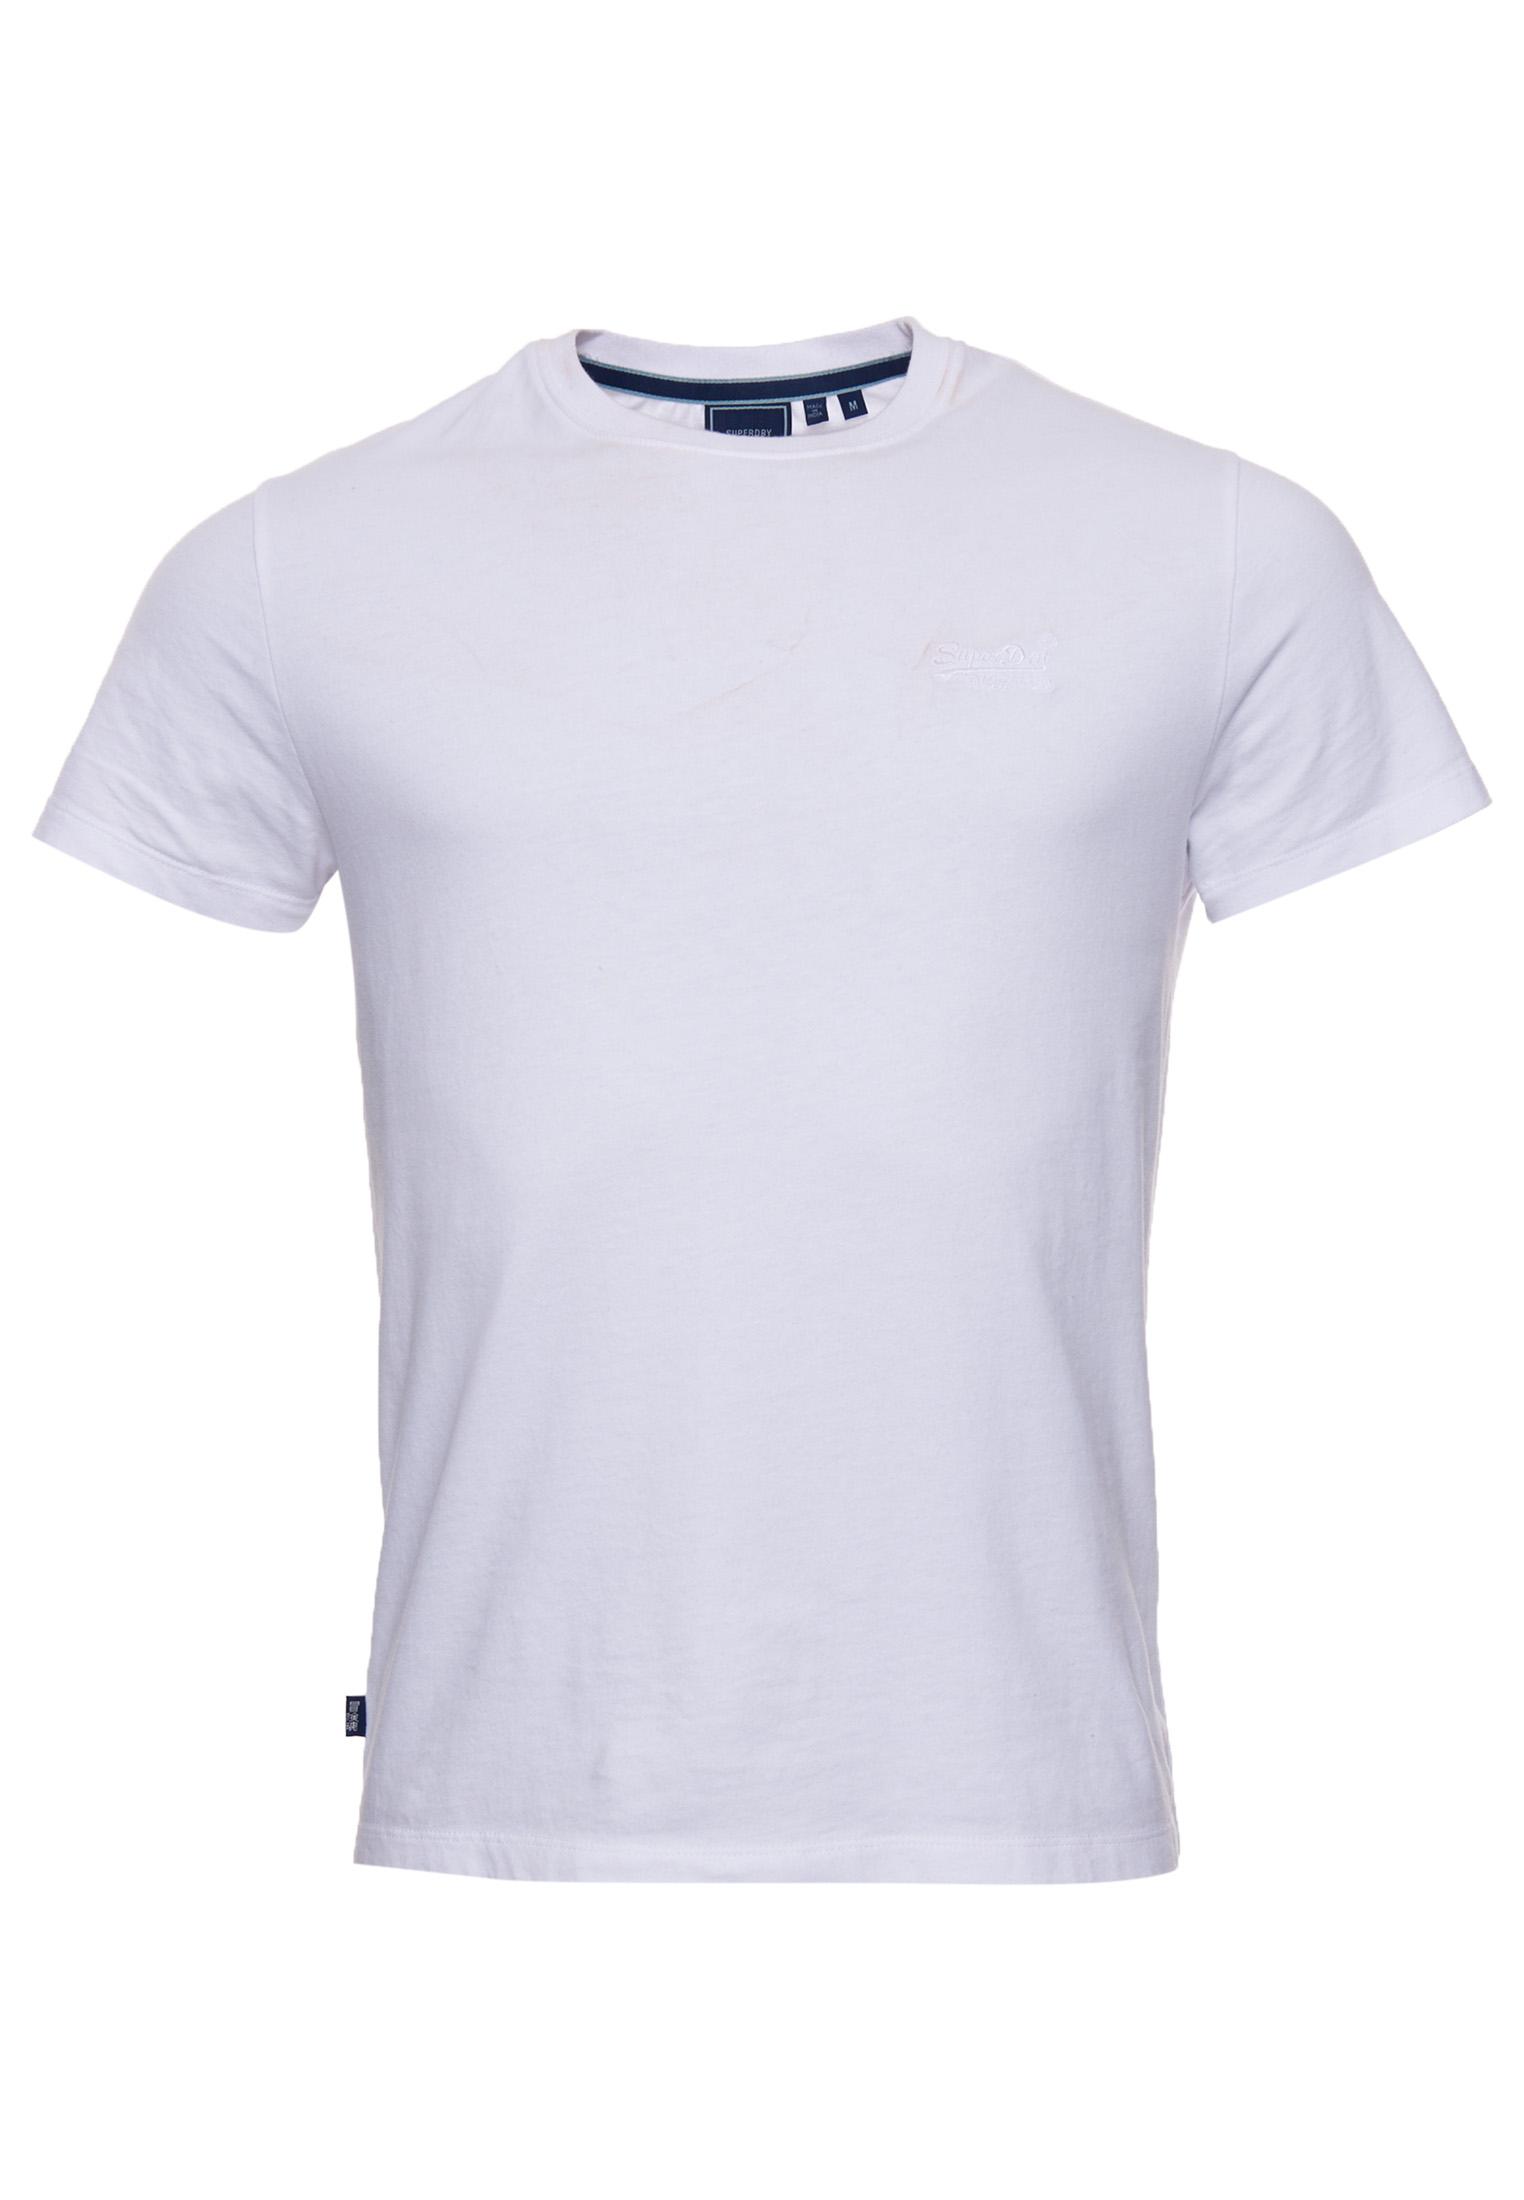 Superdry Original & Vintage Logo T-shirt, Optic, XXL